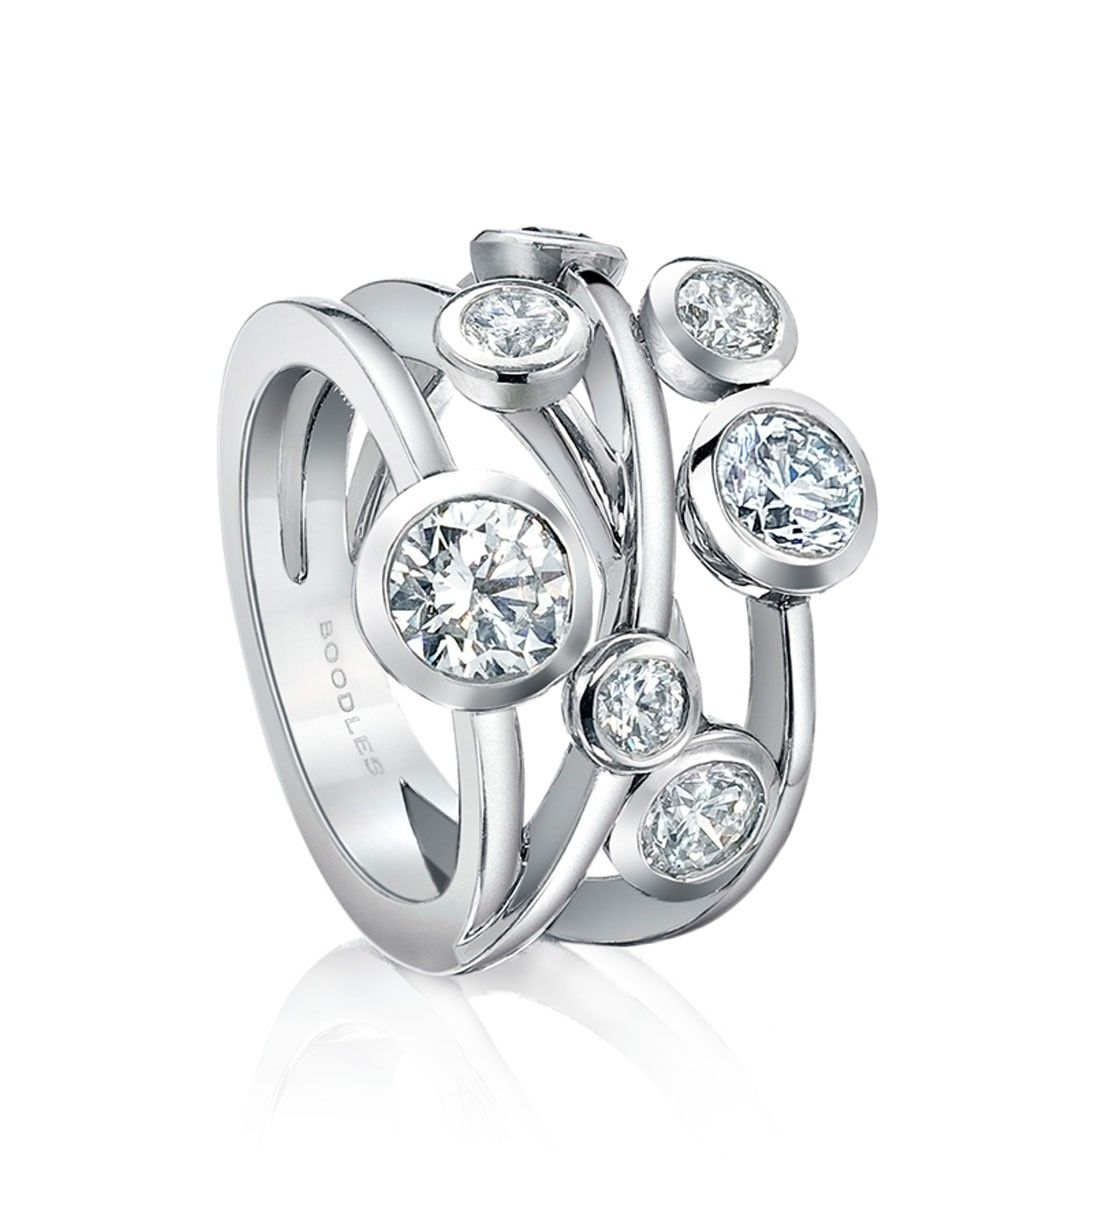 Raindance Seven Diamond And Platinum Ring | Boodles